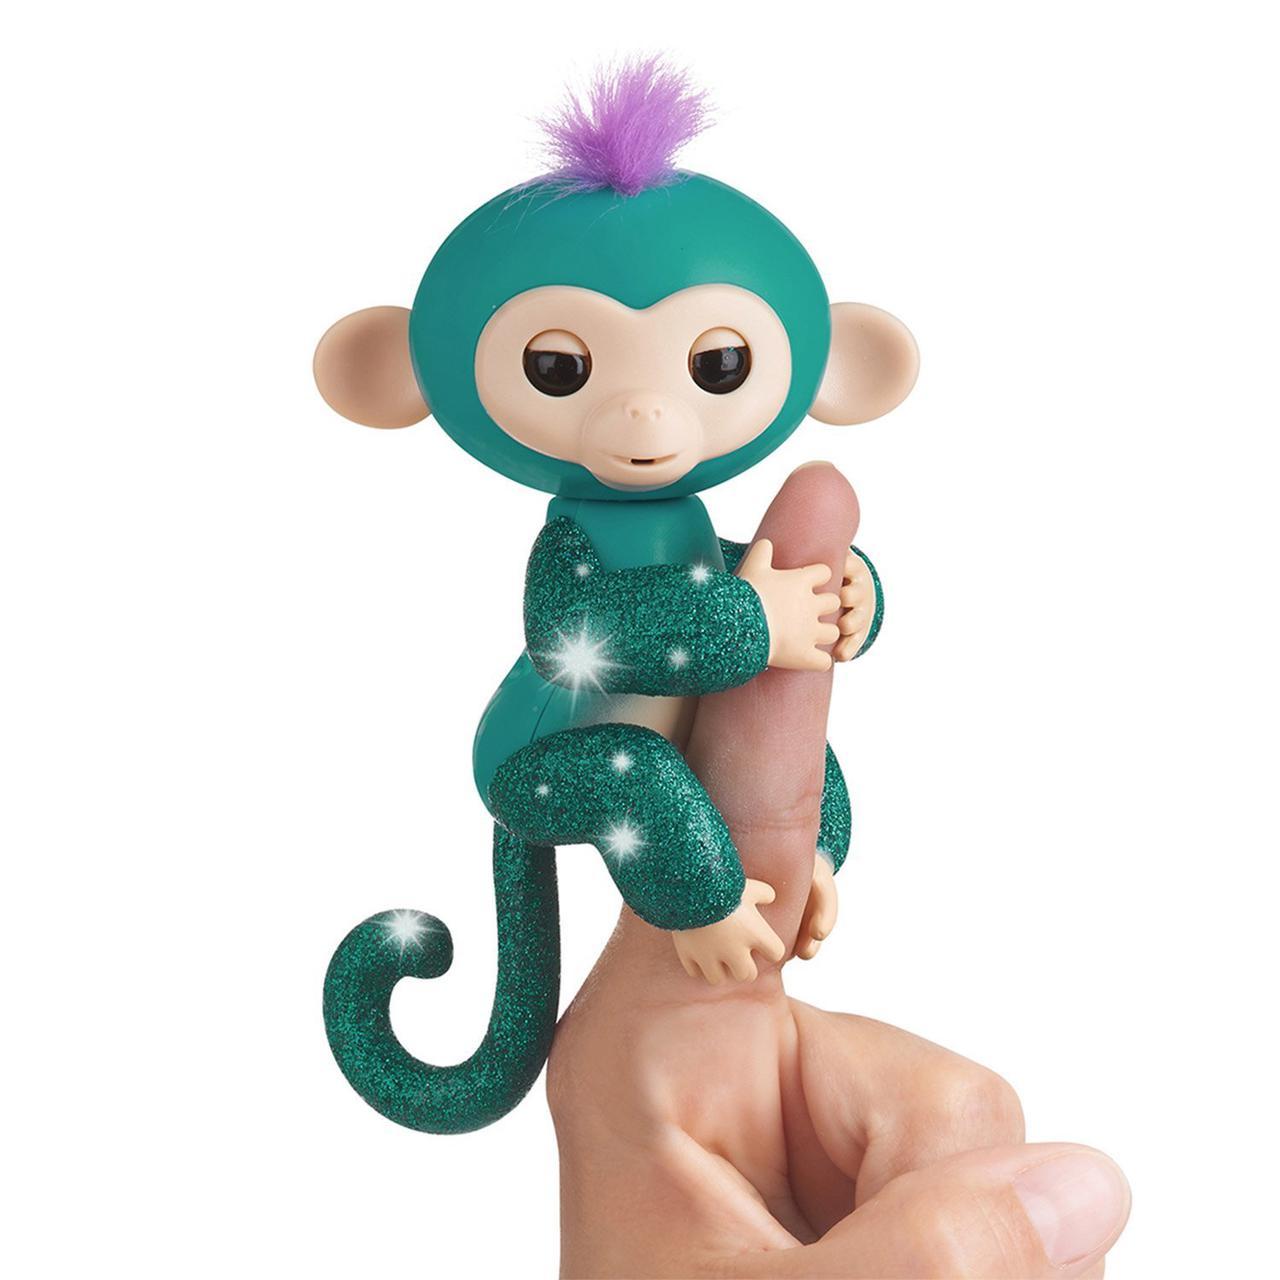 Оригинал интерактивная обезьянка Фингерлинг Блестящая - Куинси  WowWee Fingerlings Glitter Monkey - Quincy